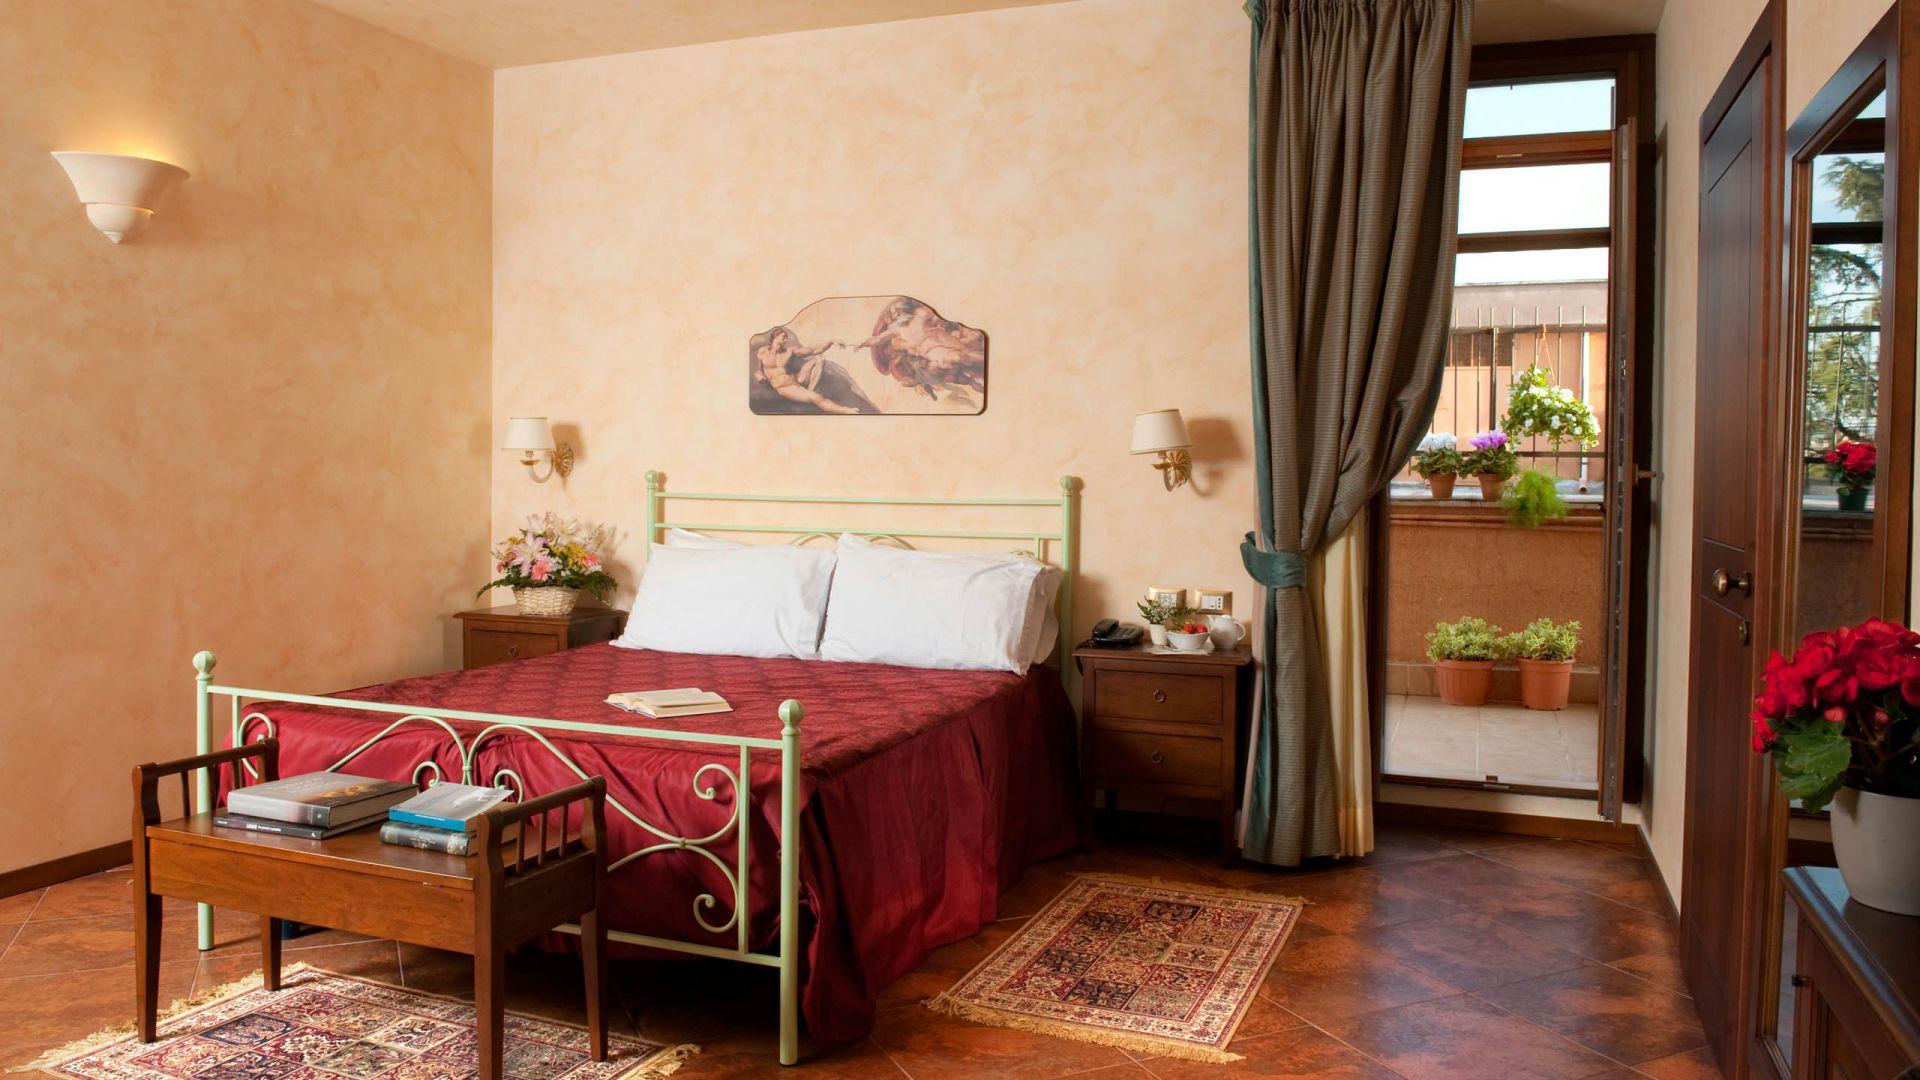 oc-hotel-villa-adriana-camere-016